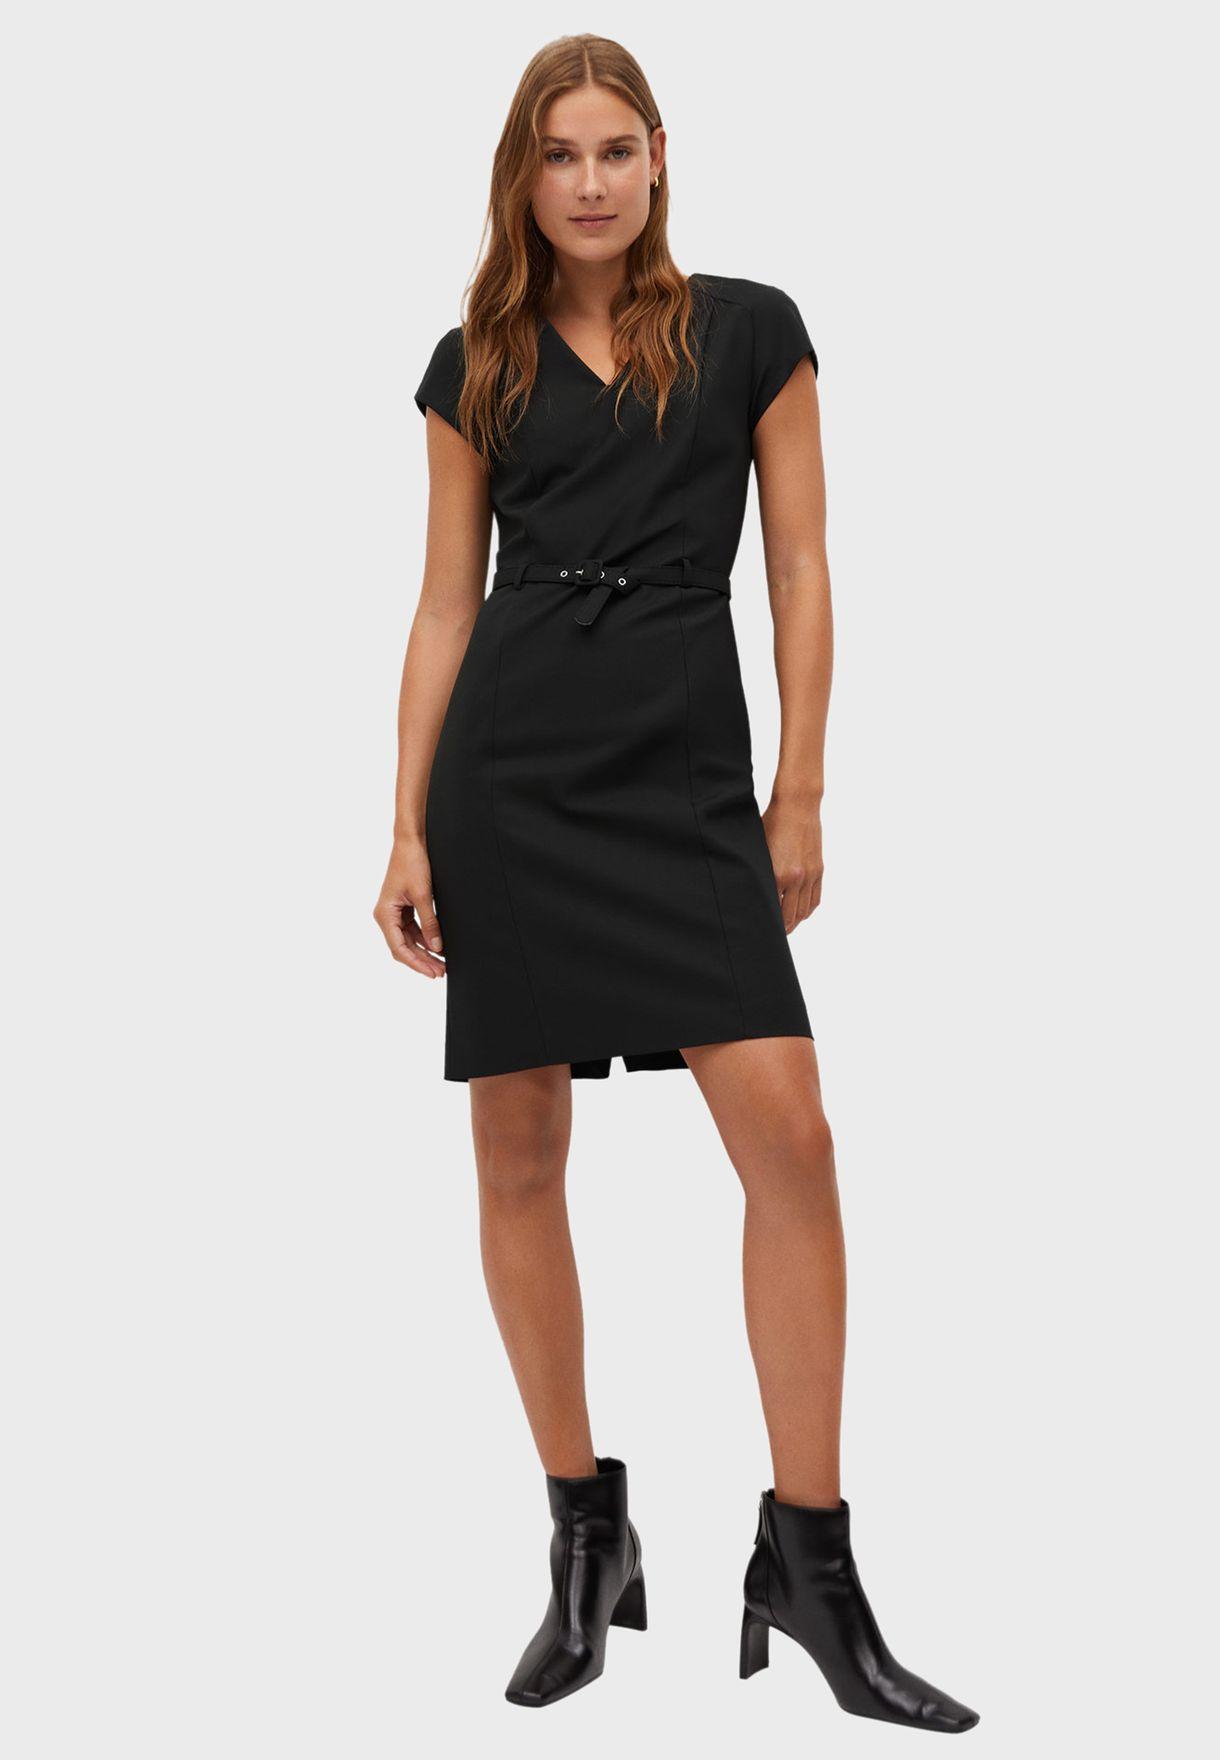 Seam Detail V-Neck Dress